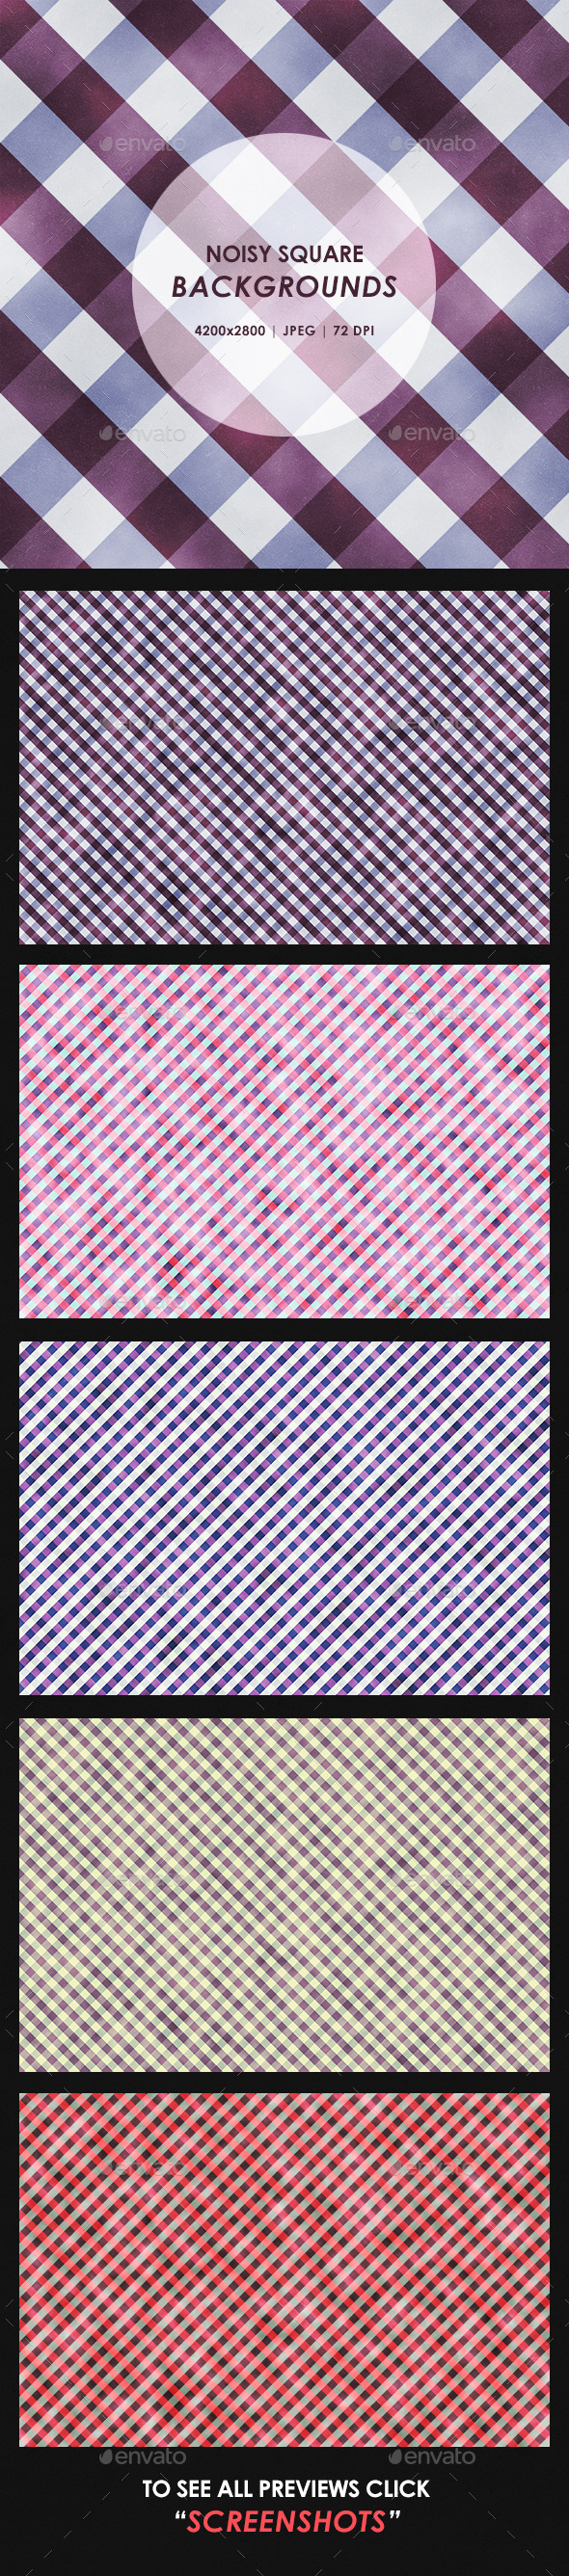 Noisy Square Mosaic Backgrounds - Patterns Backgrounds